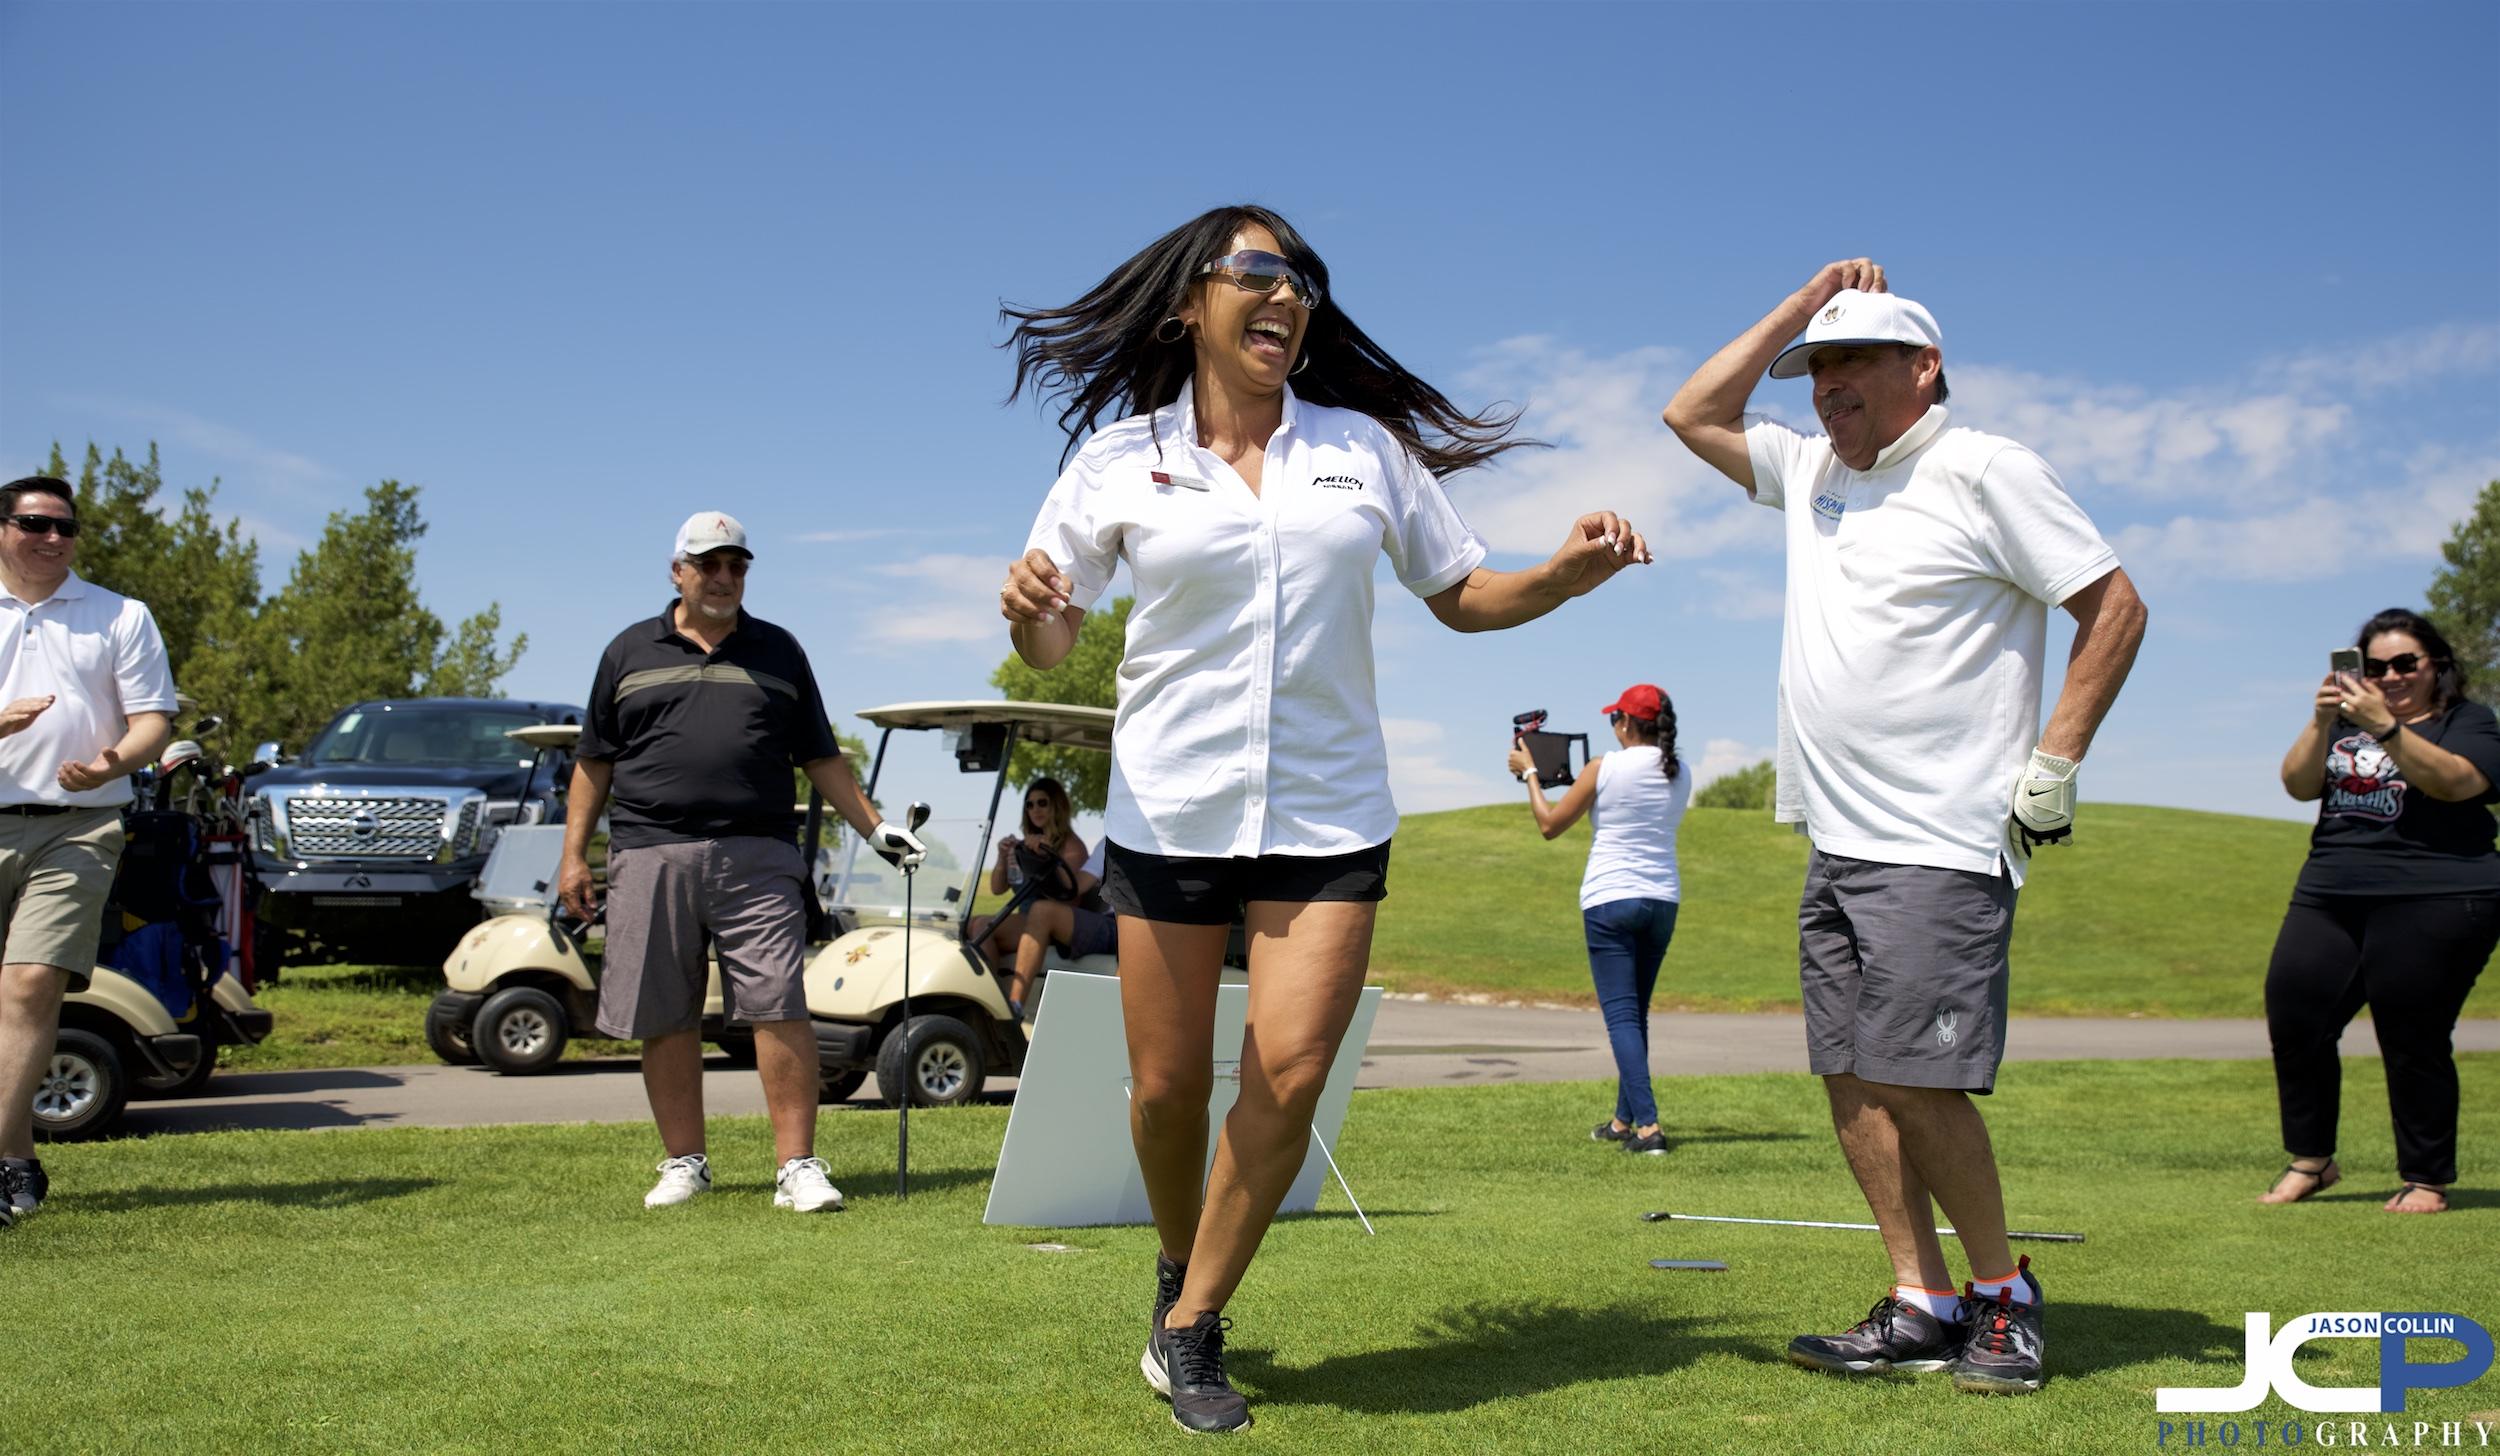 ahcc-8-16-2018-golf-100634.jpg